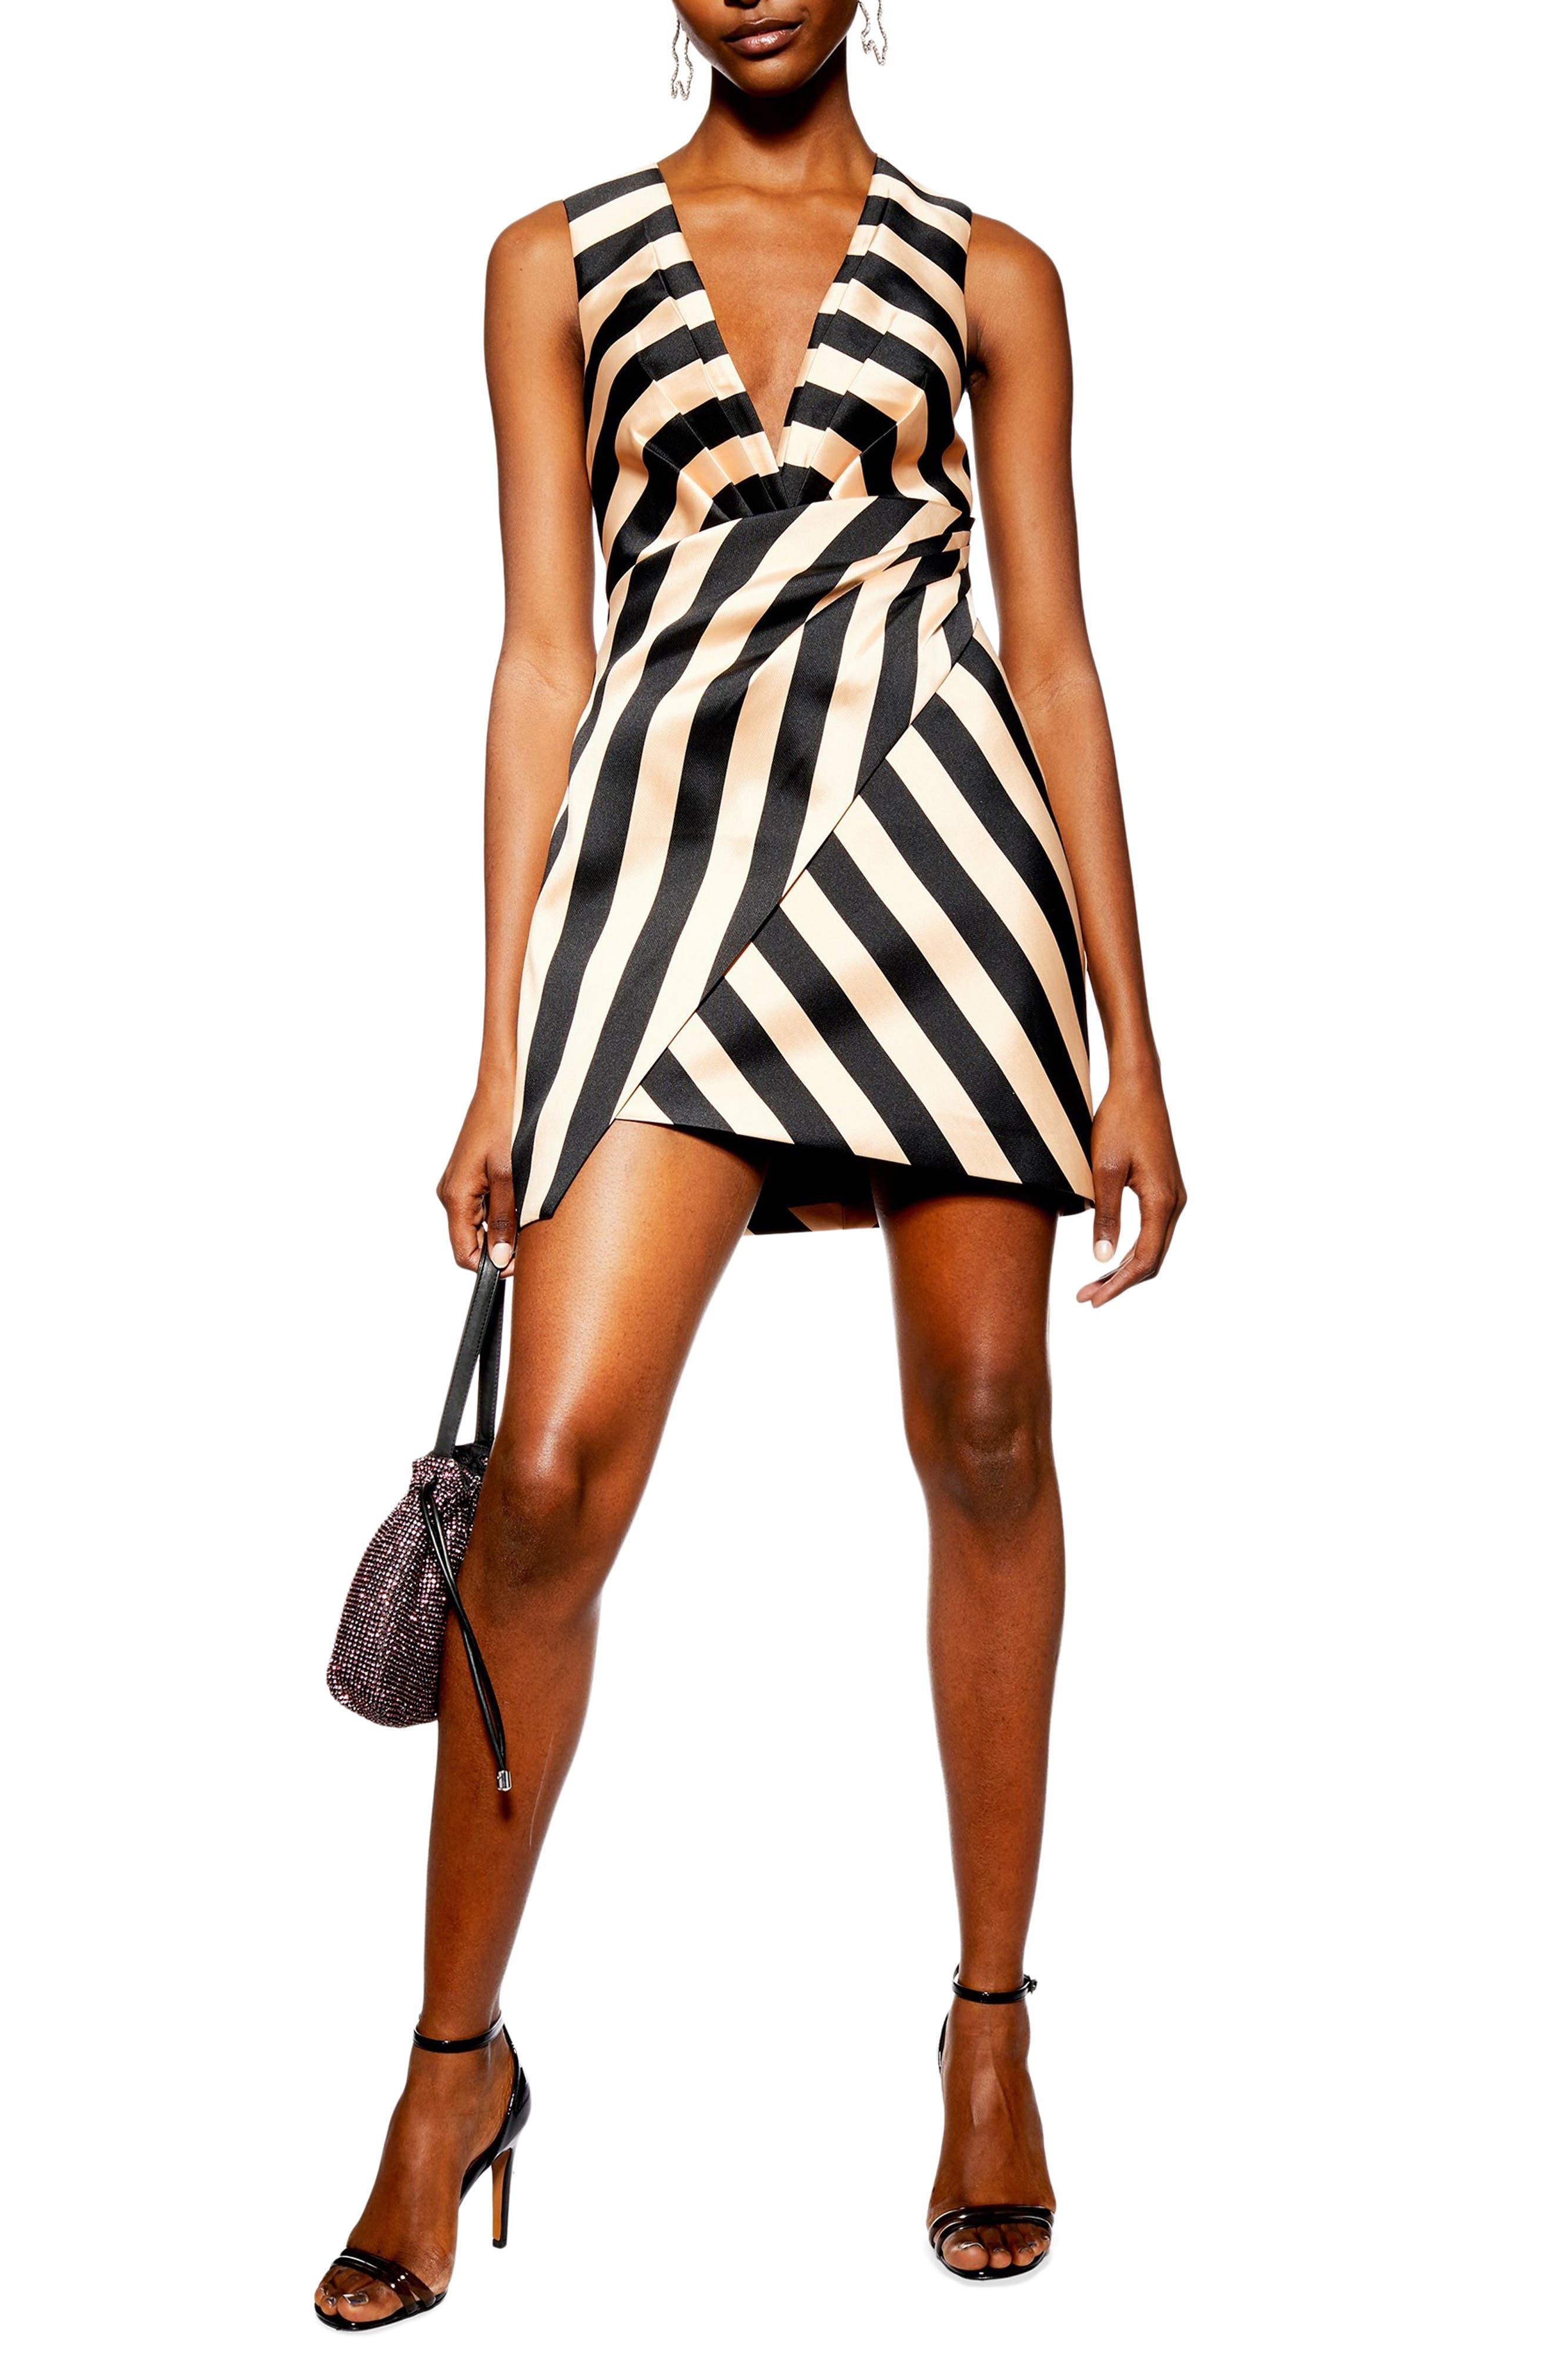 Topshop Stripe Wrap Structured Minidress, US (fits like 2-4) - Black